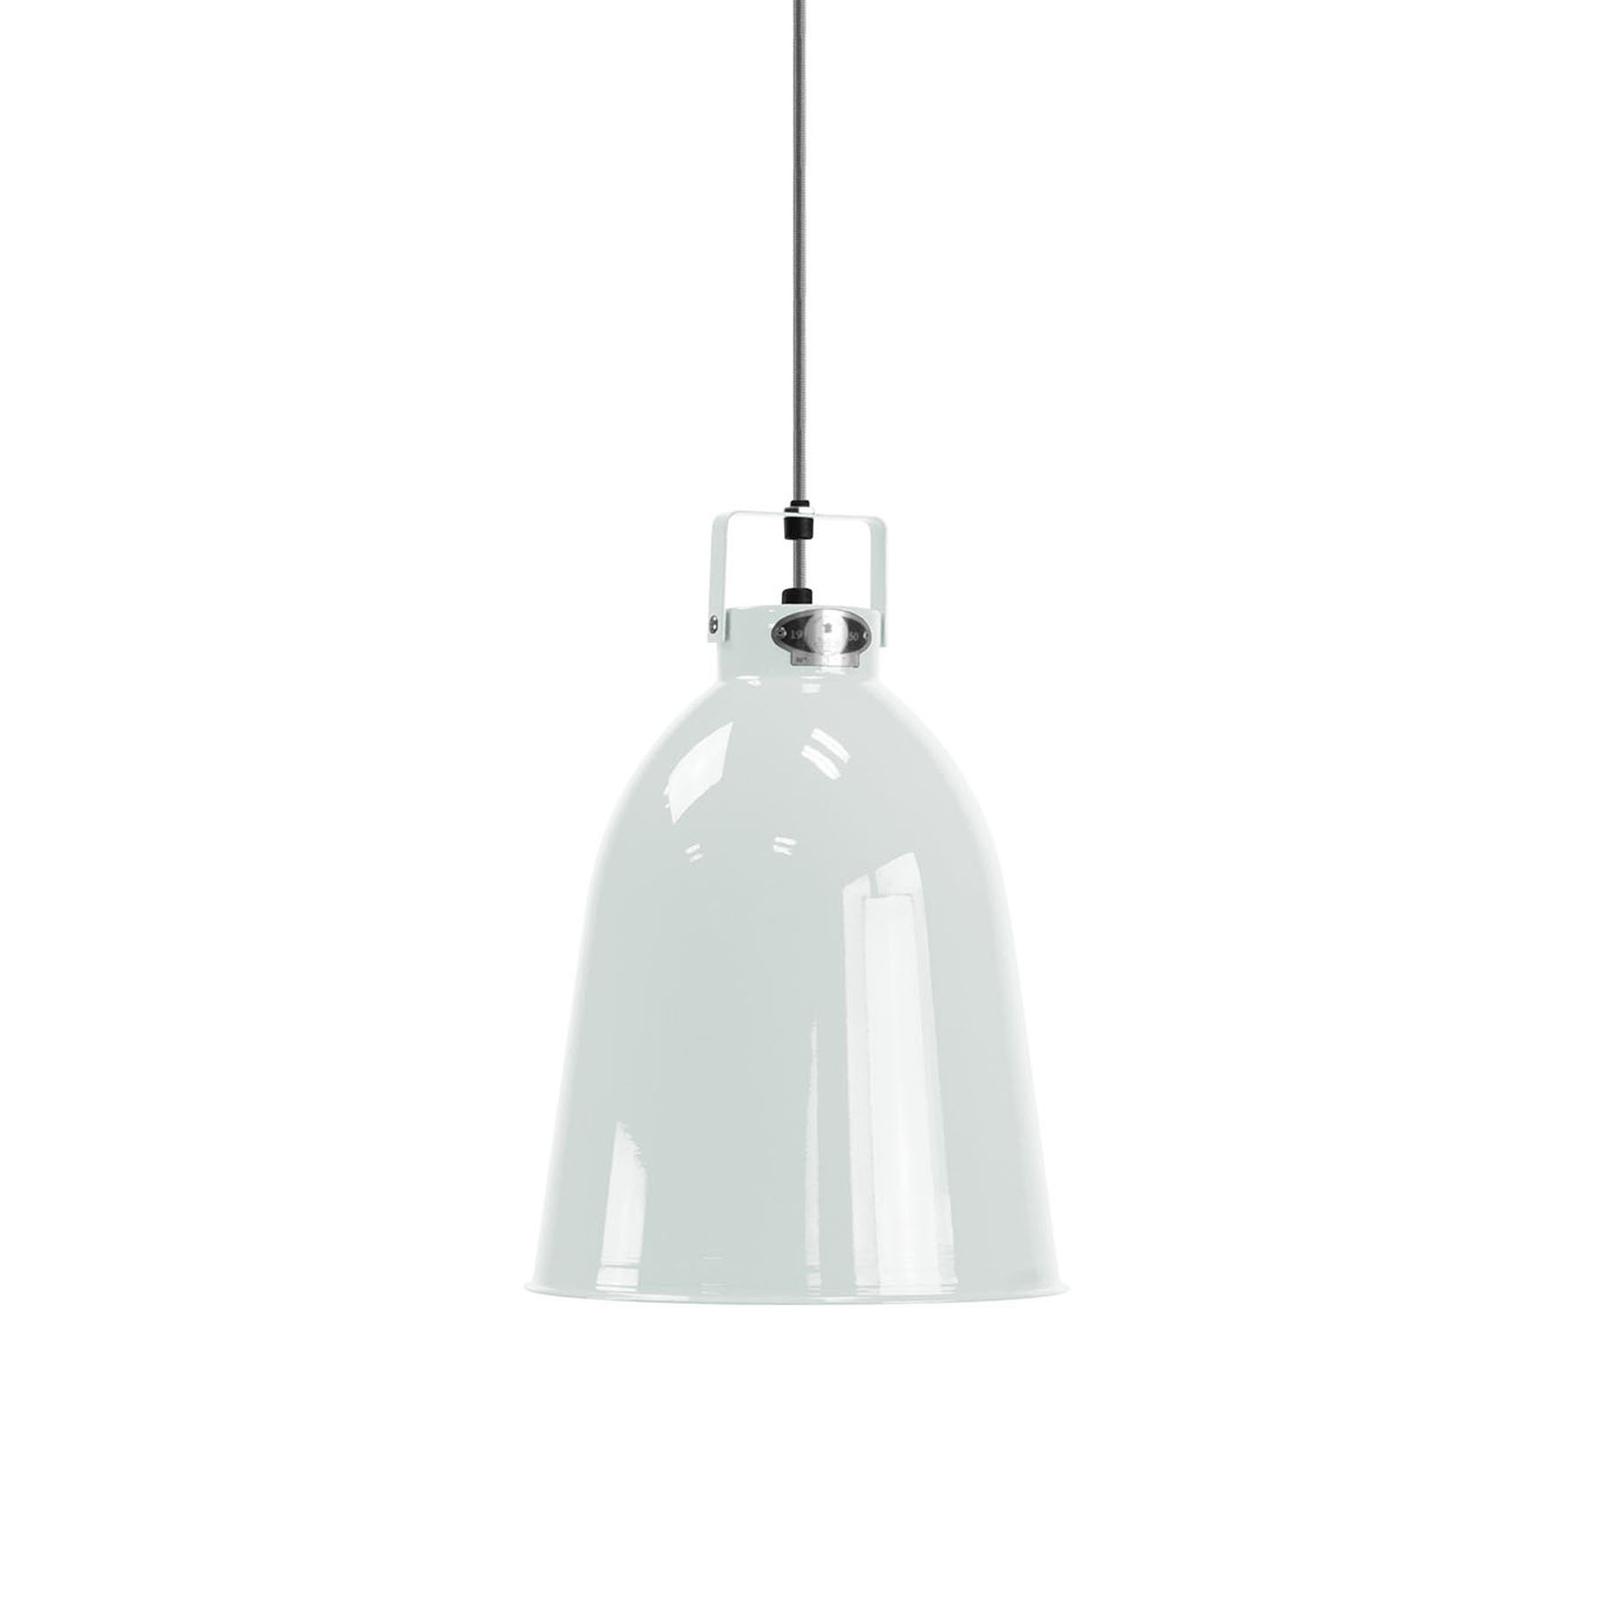 Jieldé Clément C240 lampa wisząca biała Ø24cm